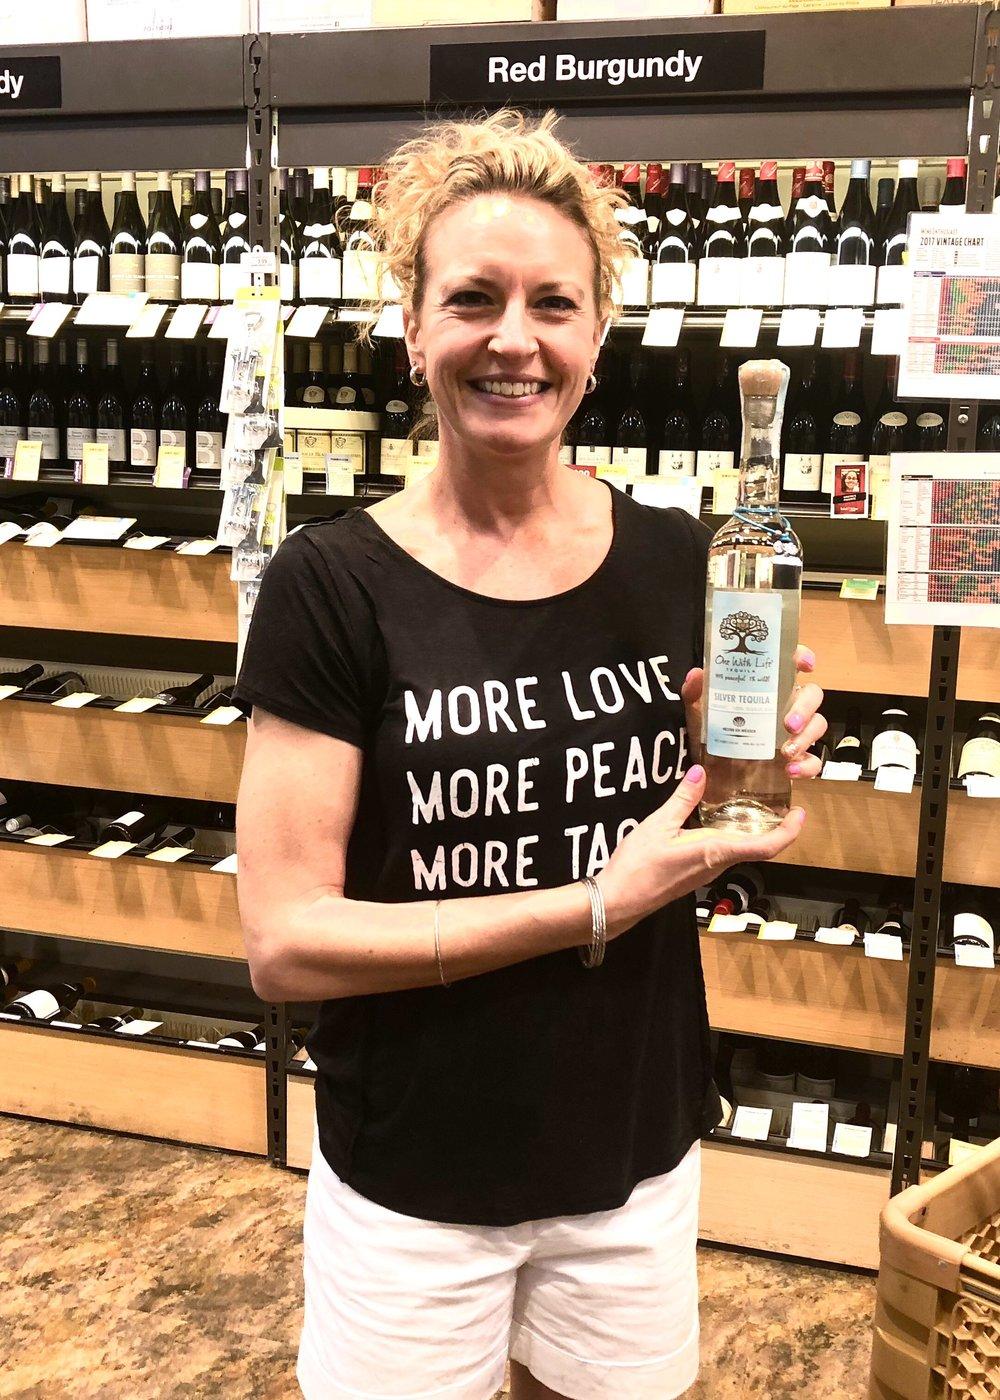 Total Wine - Ft. Lauderdale